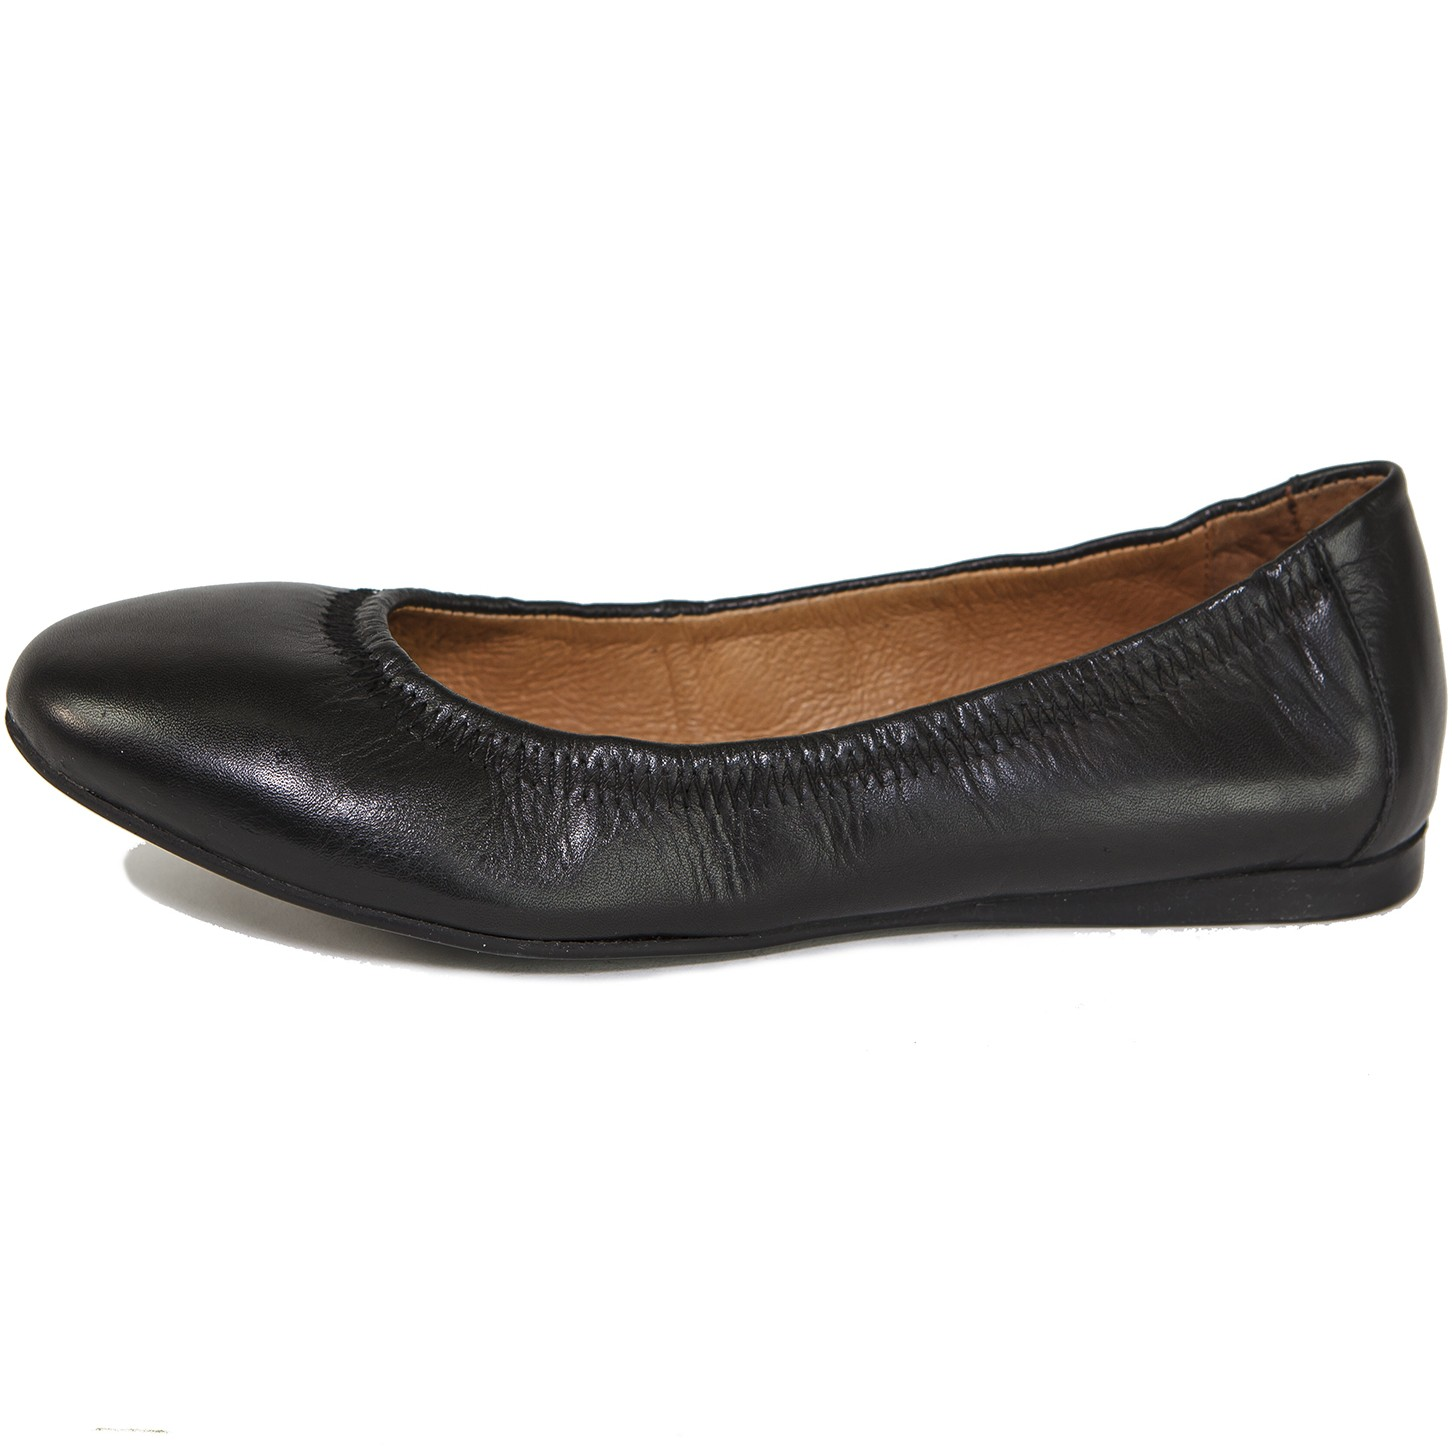 Original Alpine Swiss Womenu0026#39;s Vera Ballet Flats European Made Shoes Leather Inside U0026 Out | EBay